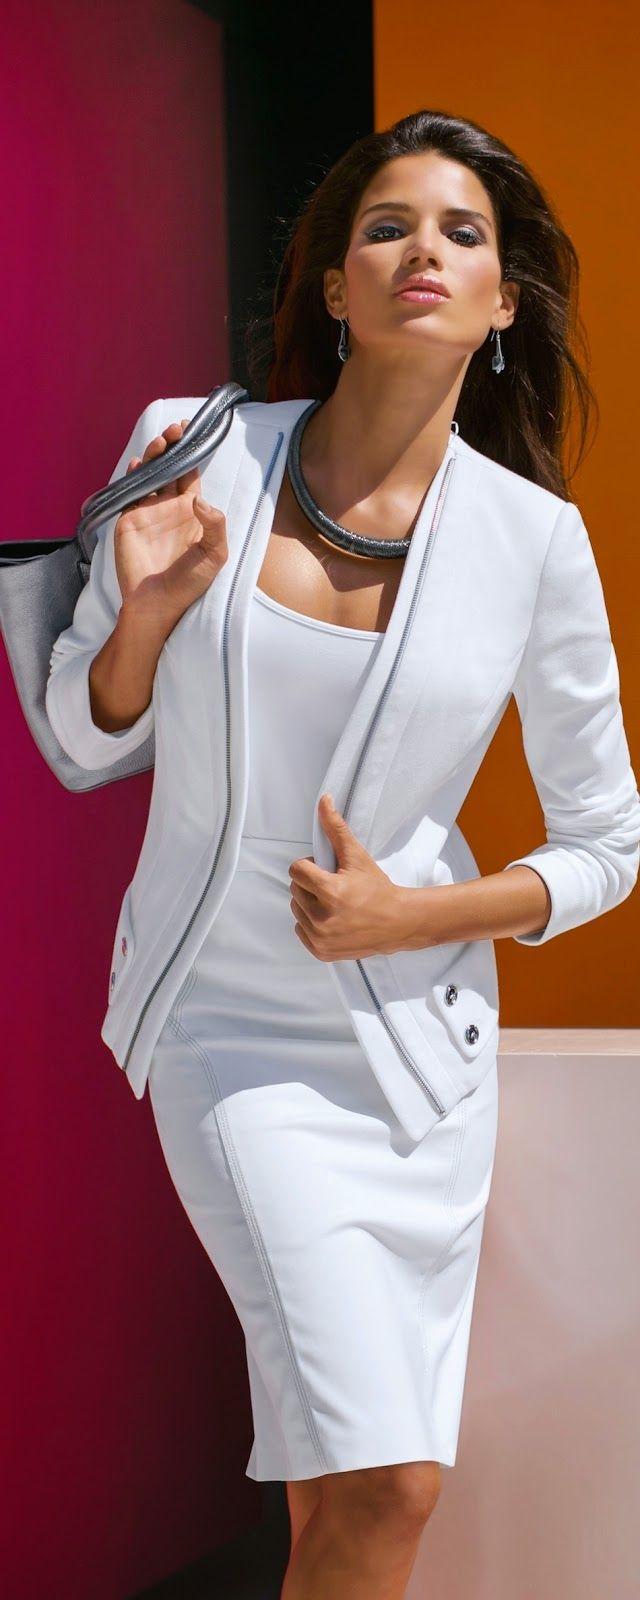 MADELEINE White Skirt and Blazer